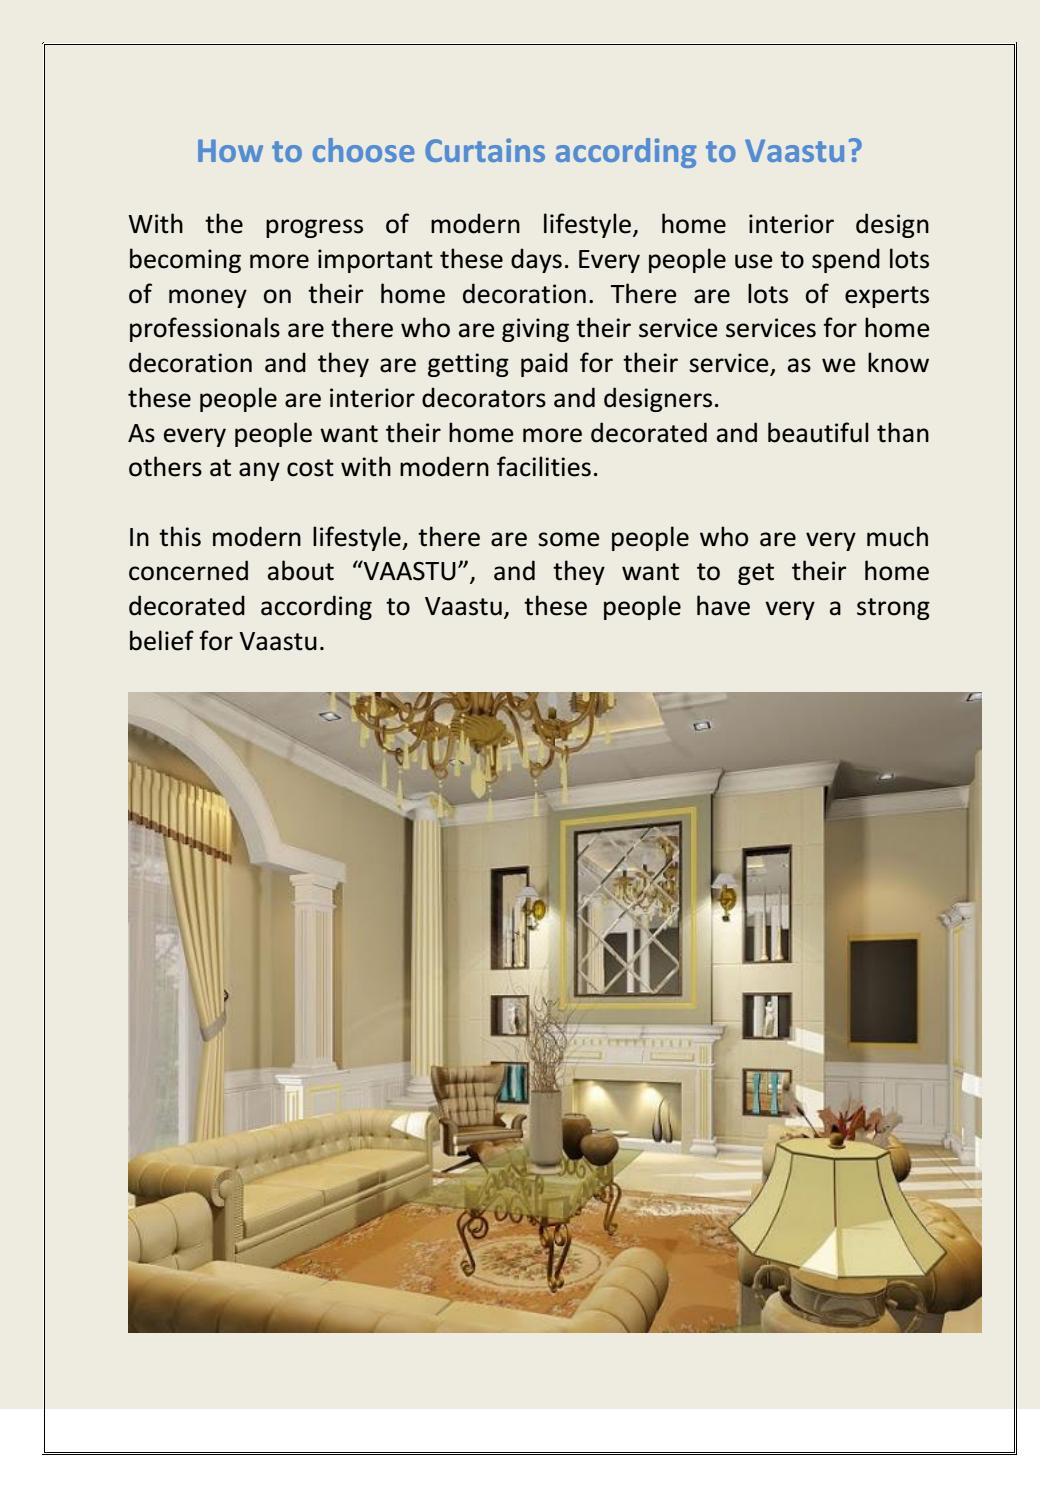 how to choose curtains according to vaastu by raju narula - issuu